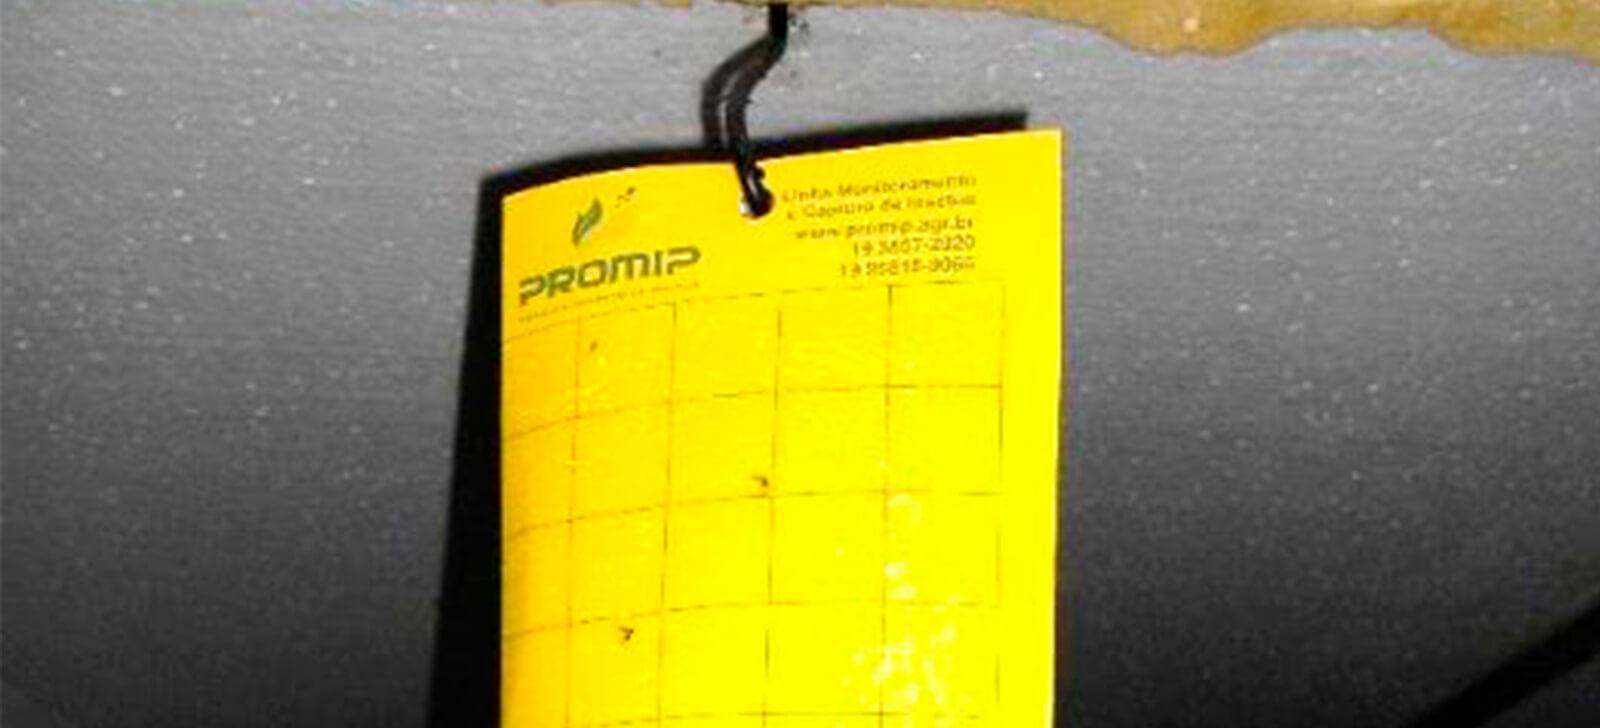 promip manejo integrado de pragas stratiomip controle fungus gnats em cogumelos armadilha amarela